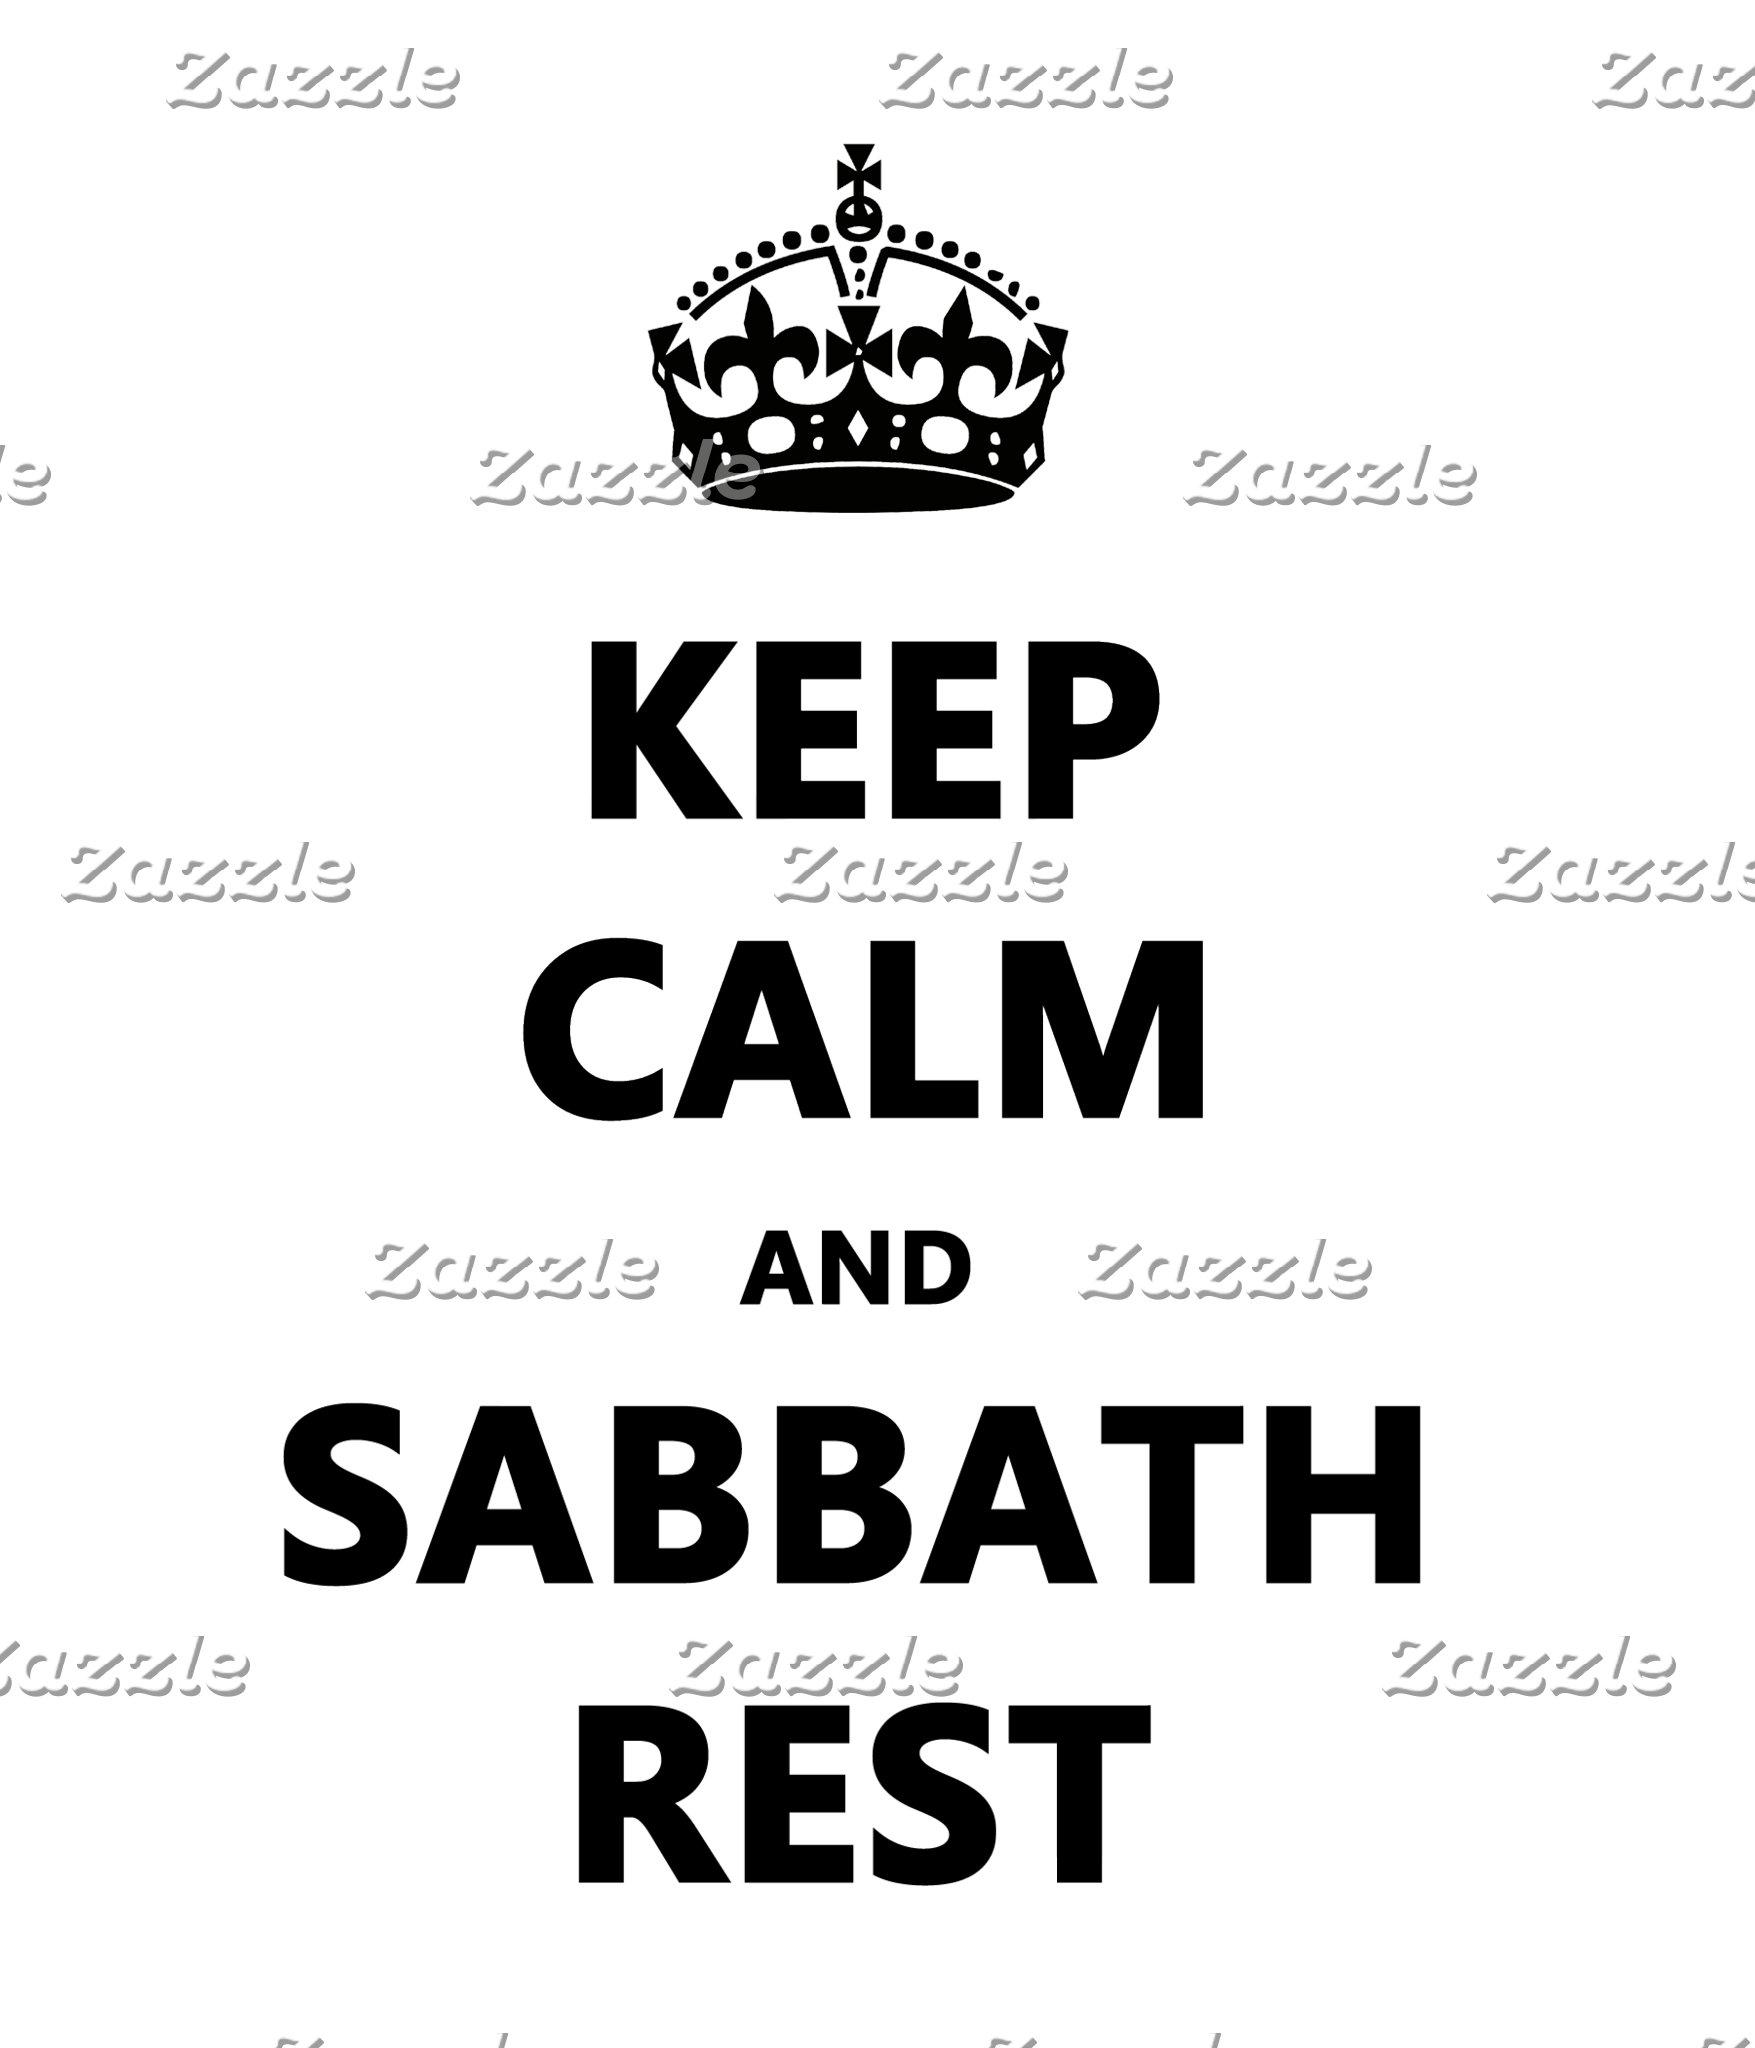 KEEP CALM and SABBATH REST